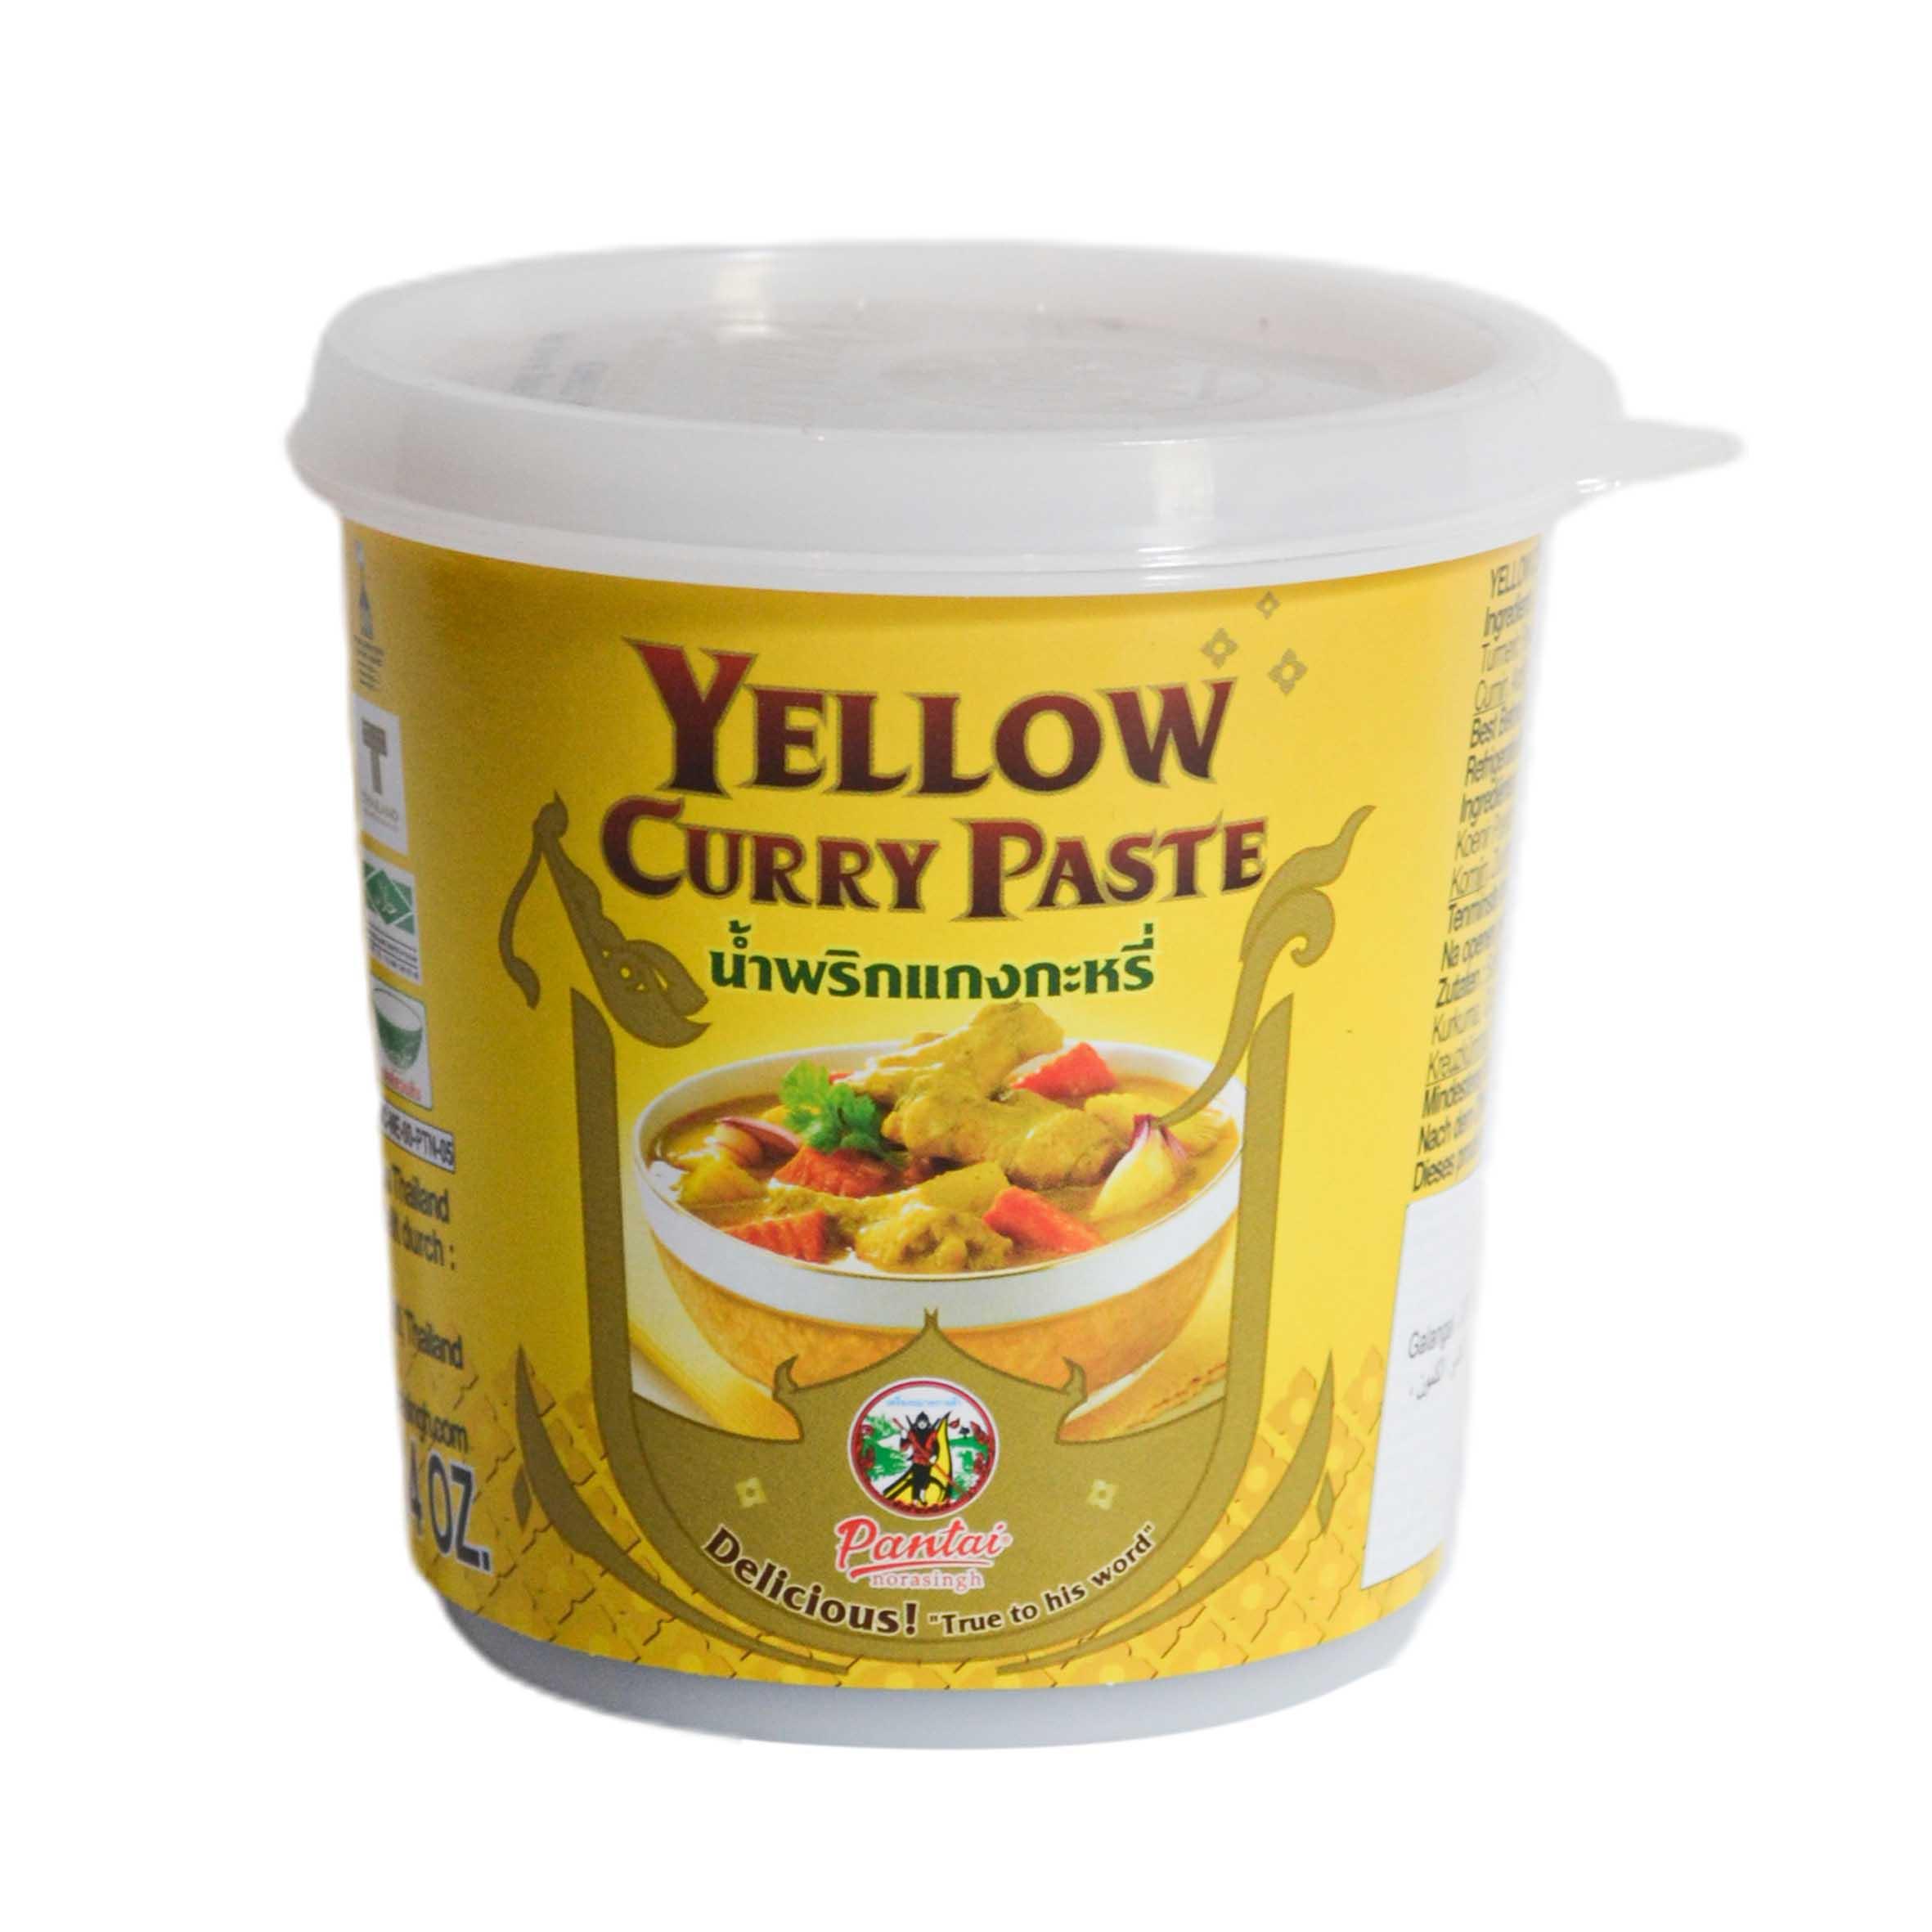 Sarı pasta kari, 400 q